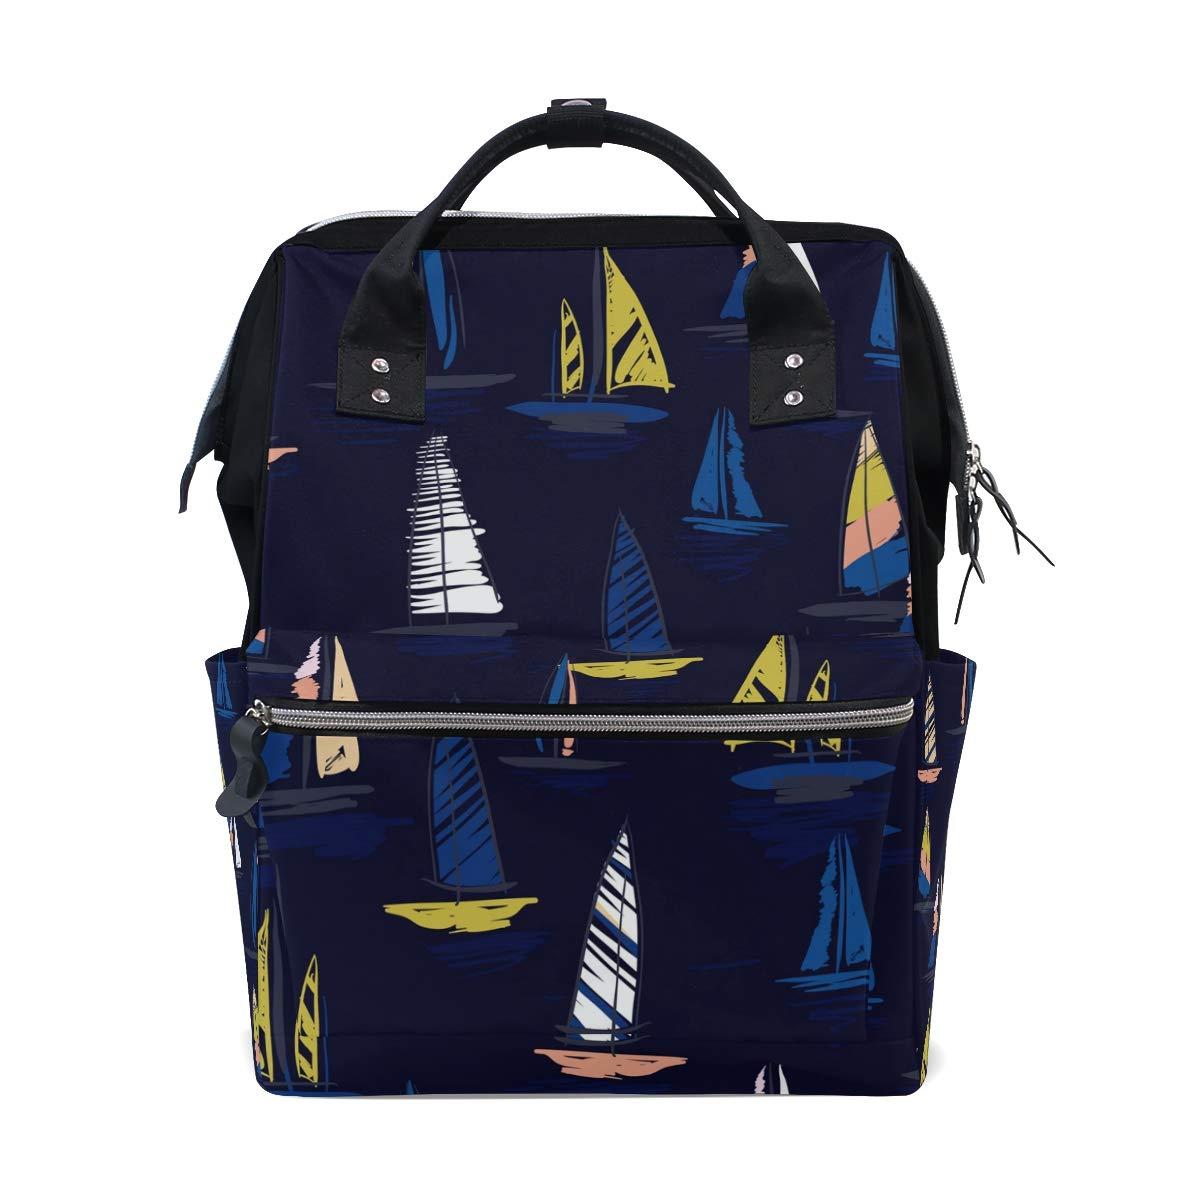 Dark Blue Sailboat Pattern School Backpack Large Capacity Mummy Bags Laptop Handbag Casual Travel Rucksack Satchel For Women Men Adult Teen Children